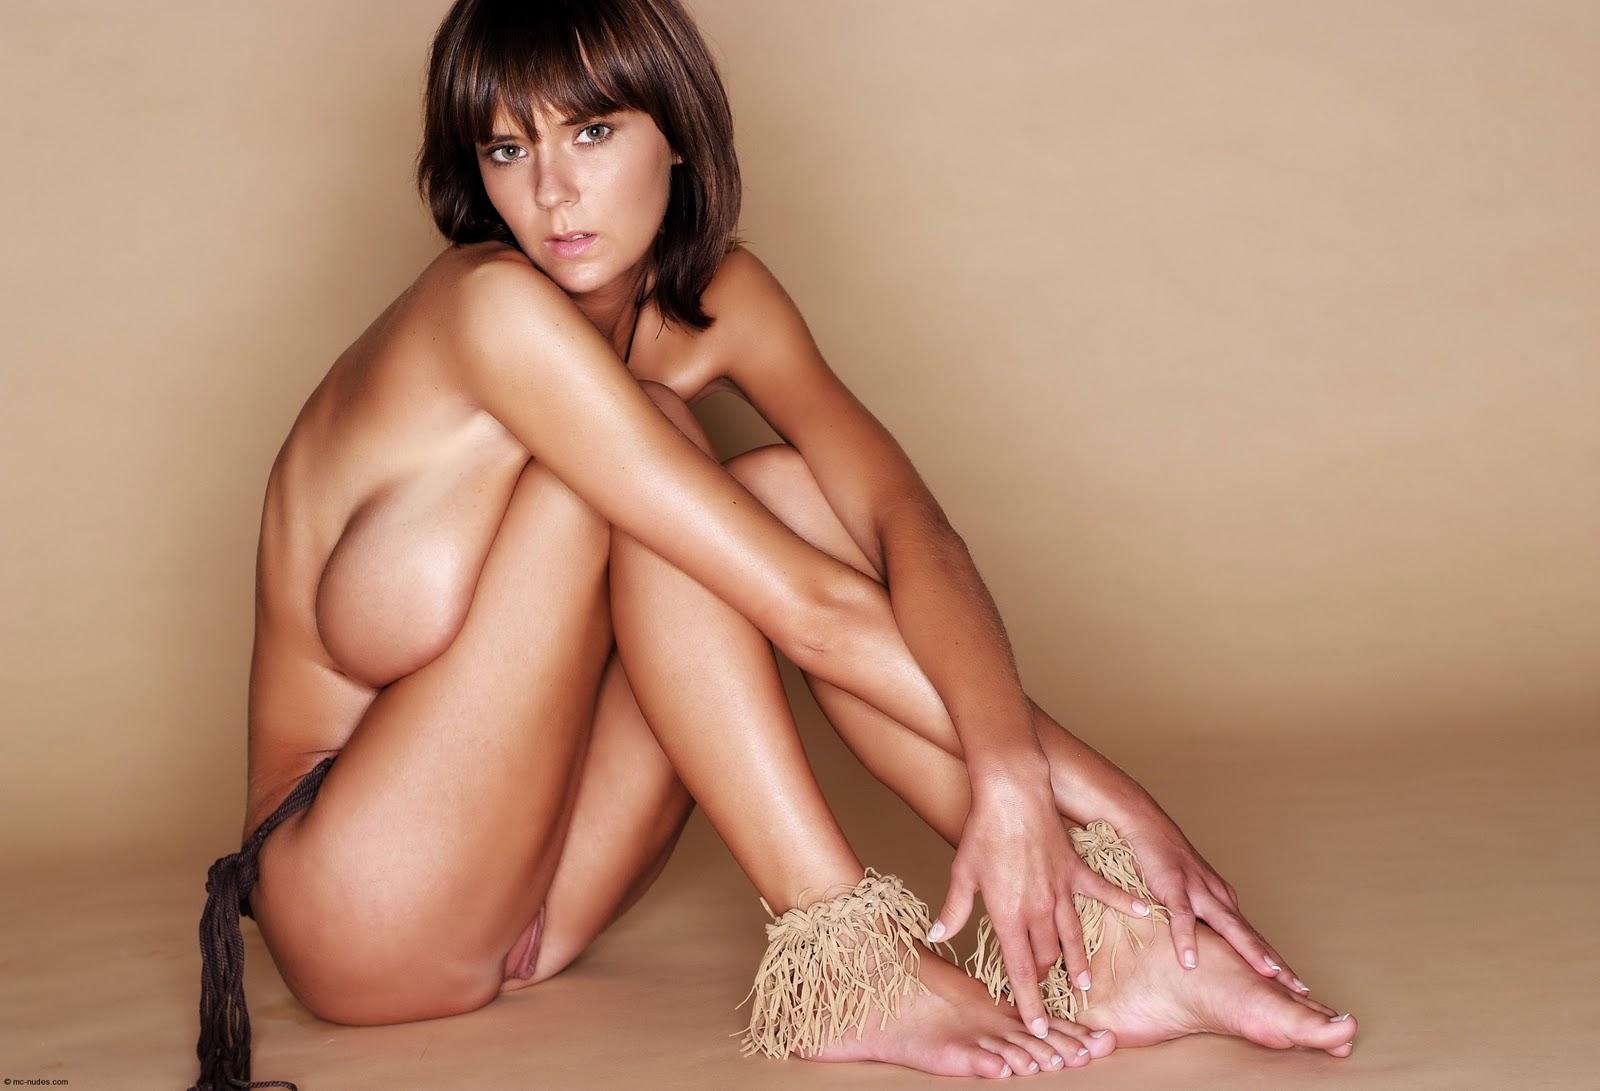 Gabrielle greece nude pics — img 12